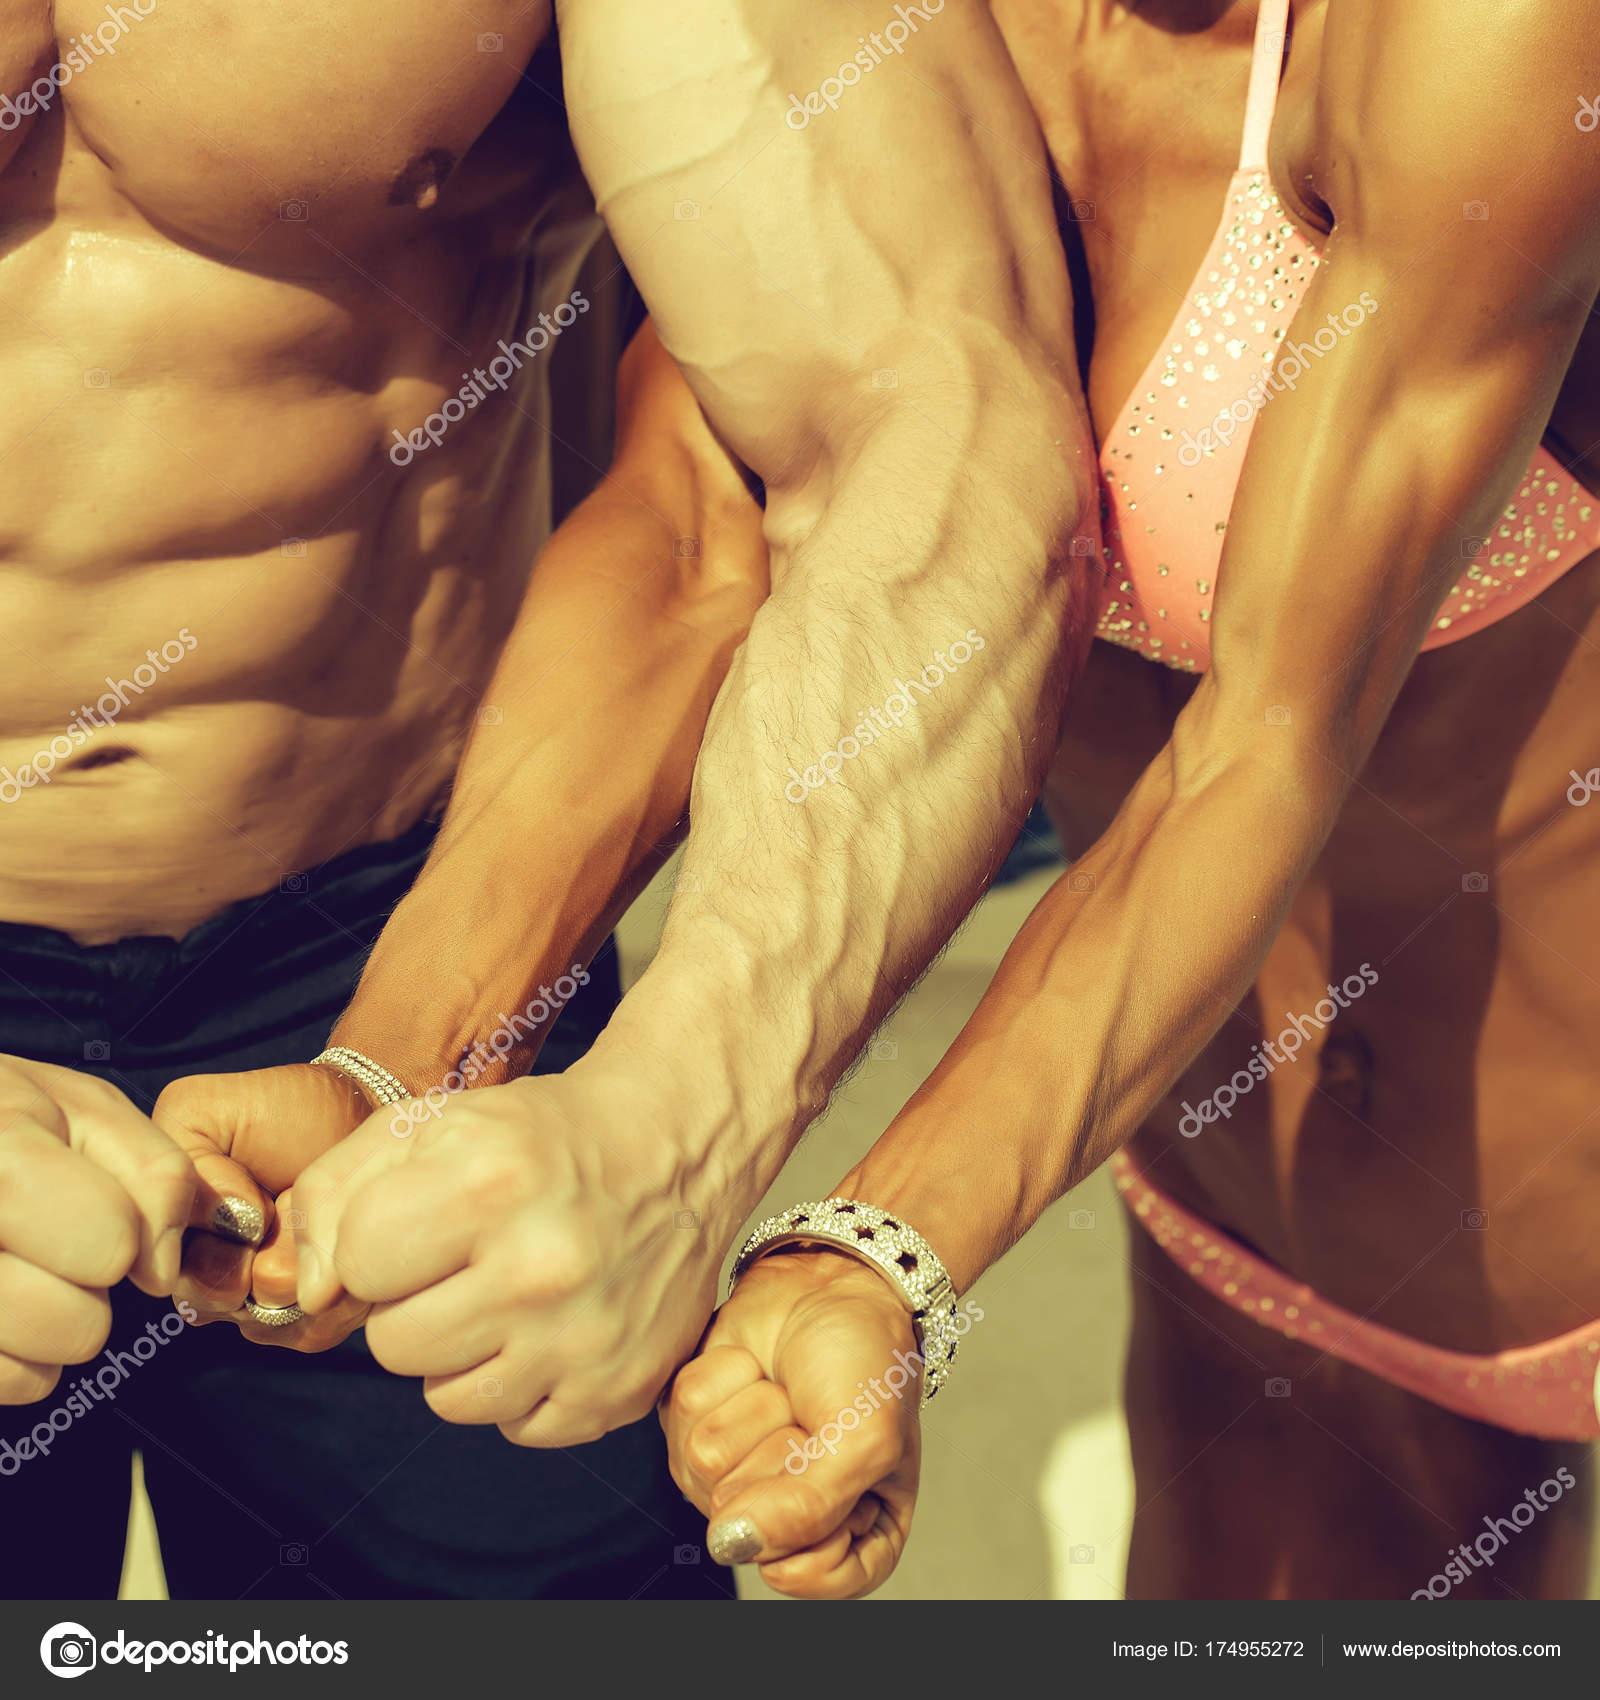 Sporty Couple Show Muscular Arms Stock Photo Tverdohlib